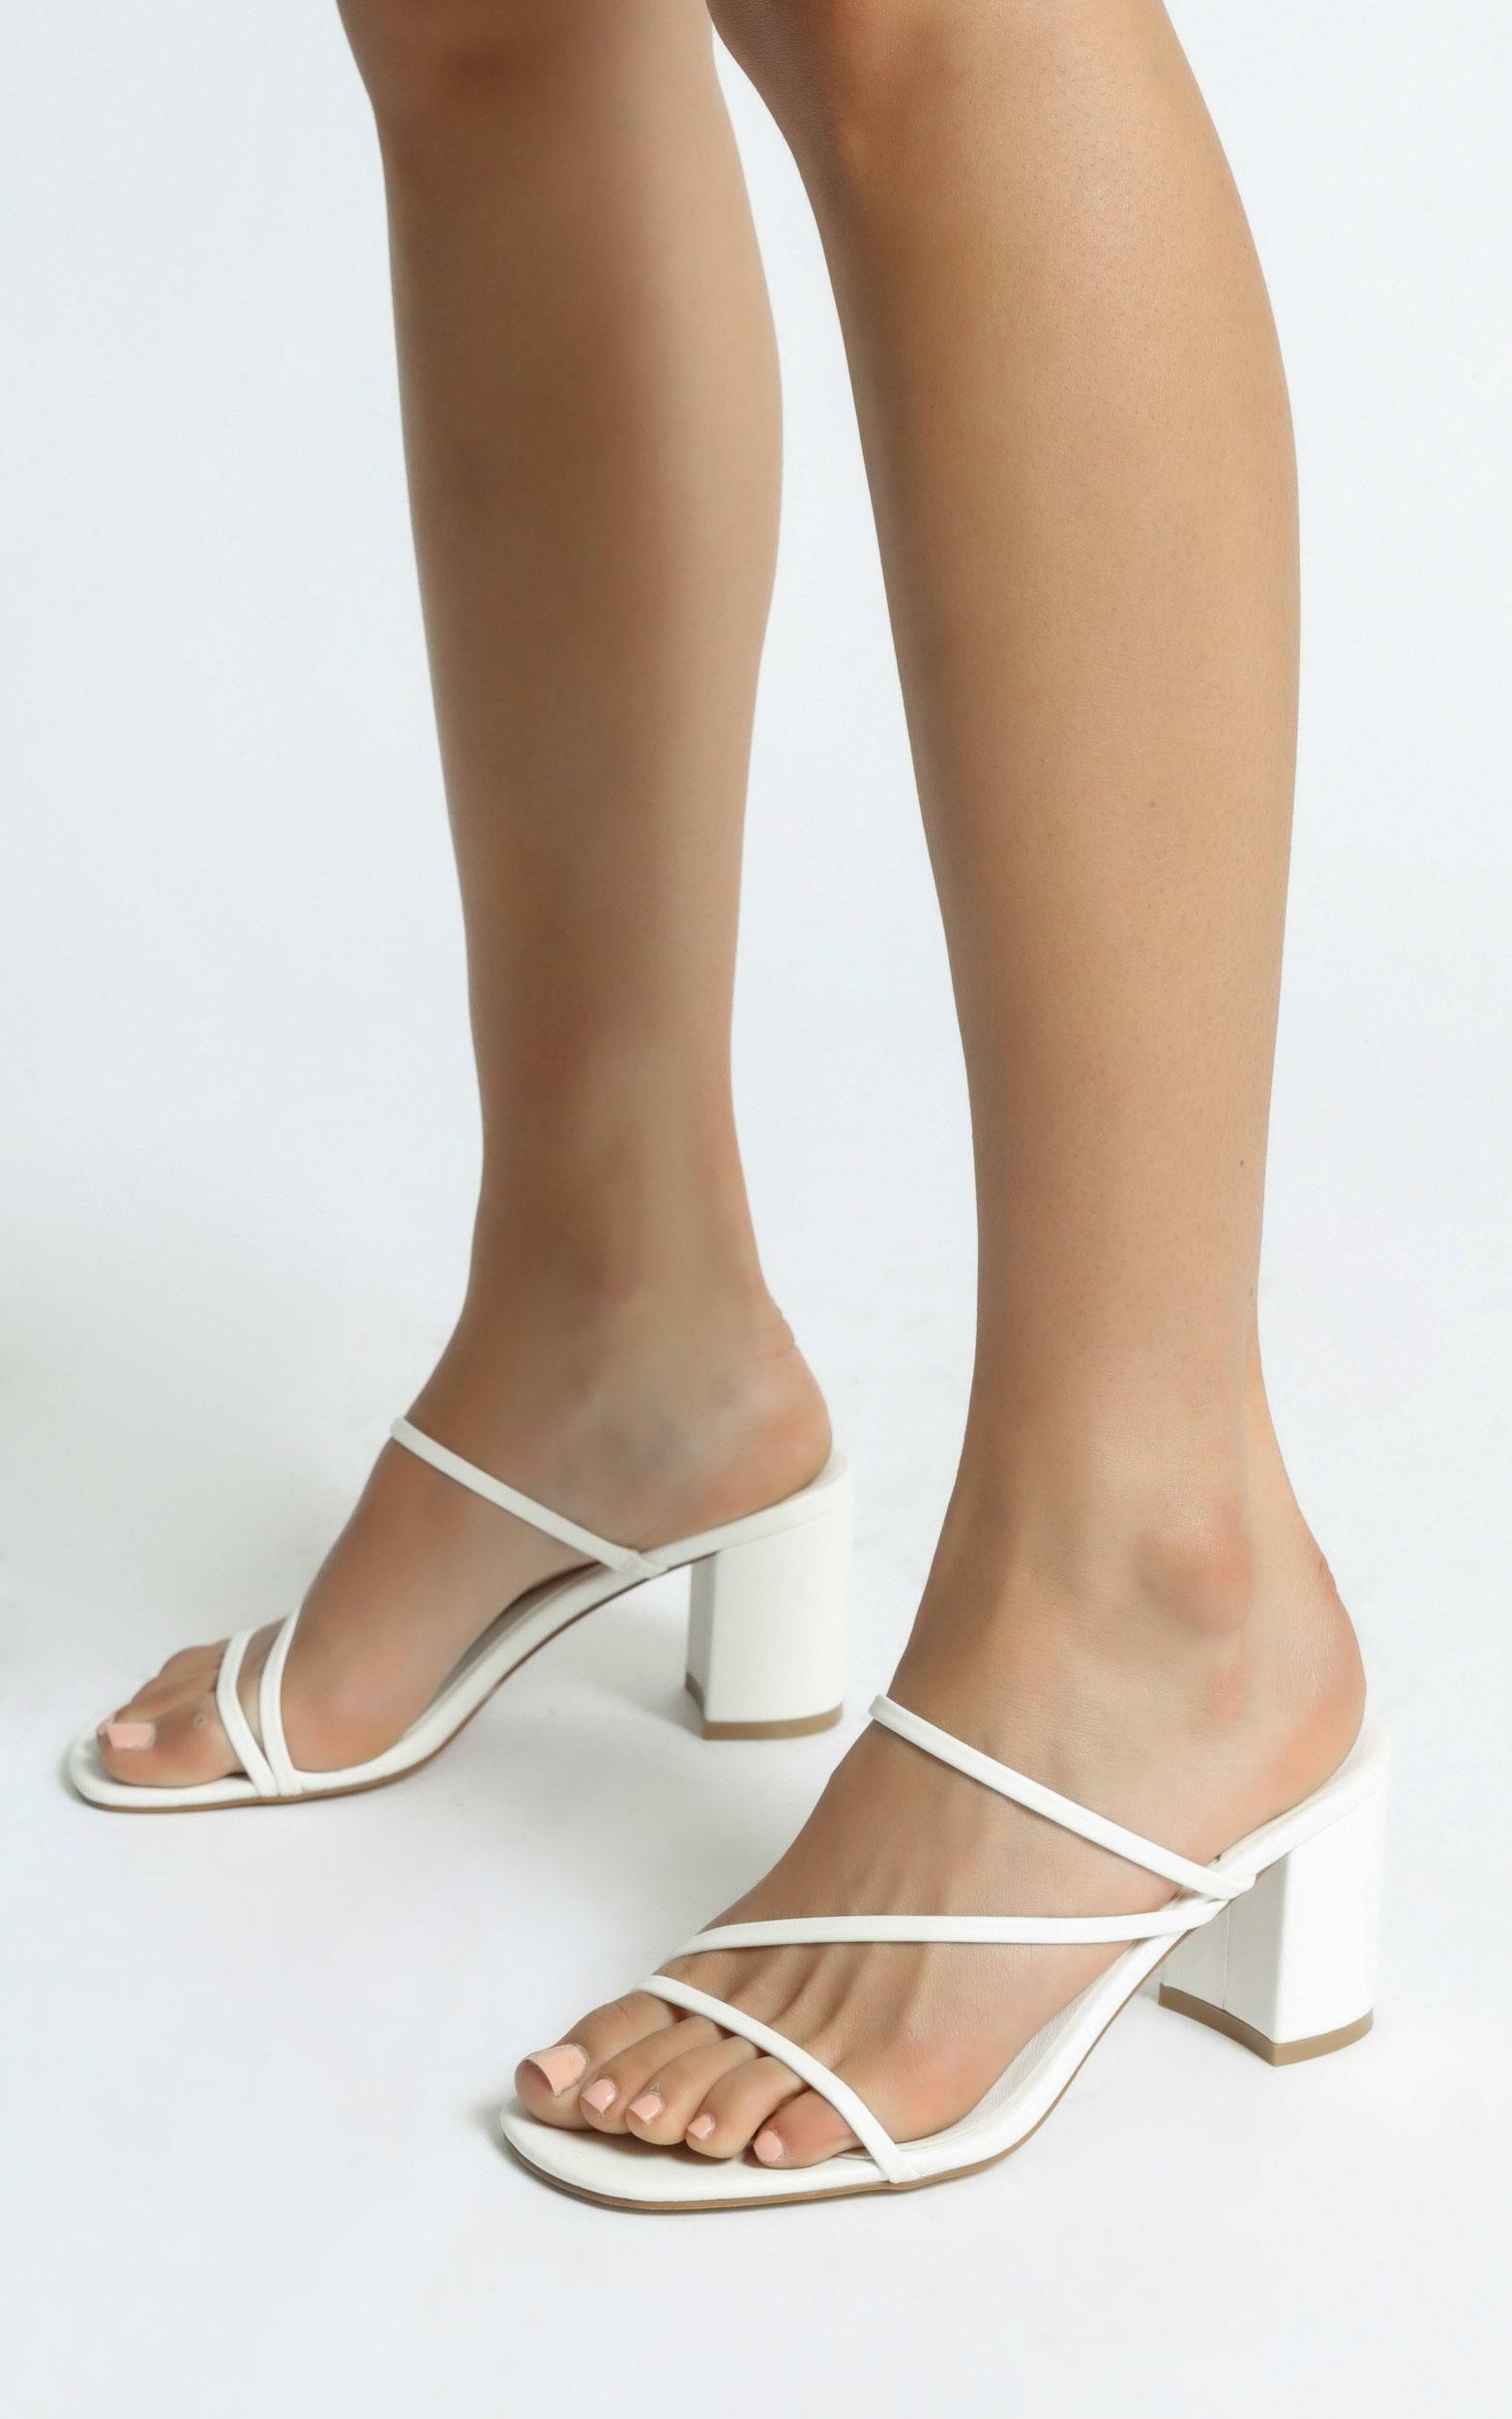 Billini - Yazmin Heels in White - 5, White, hi-res image number null